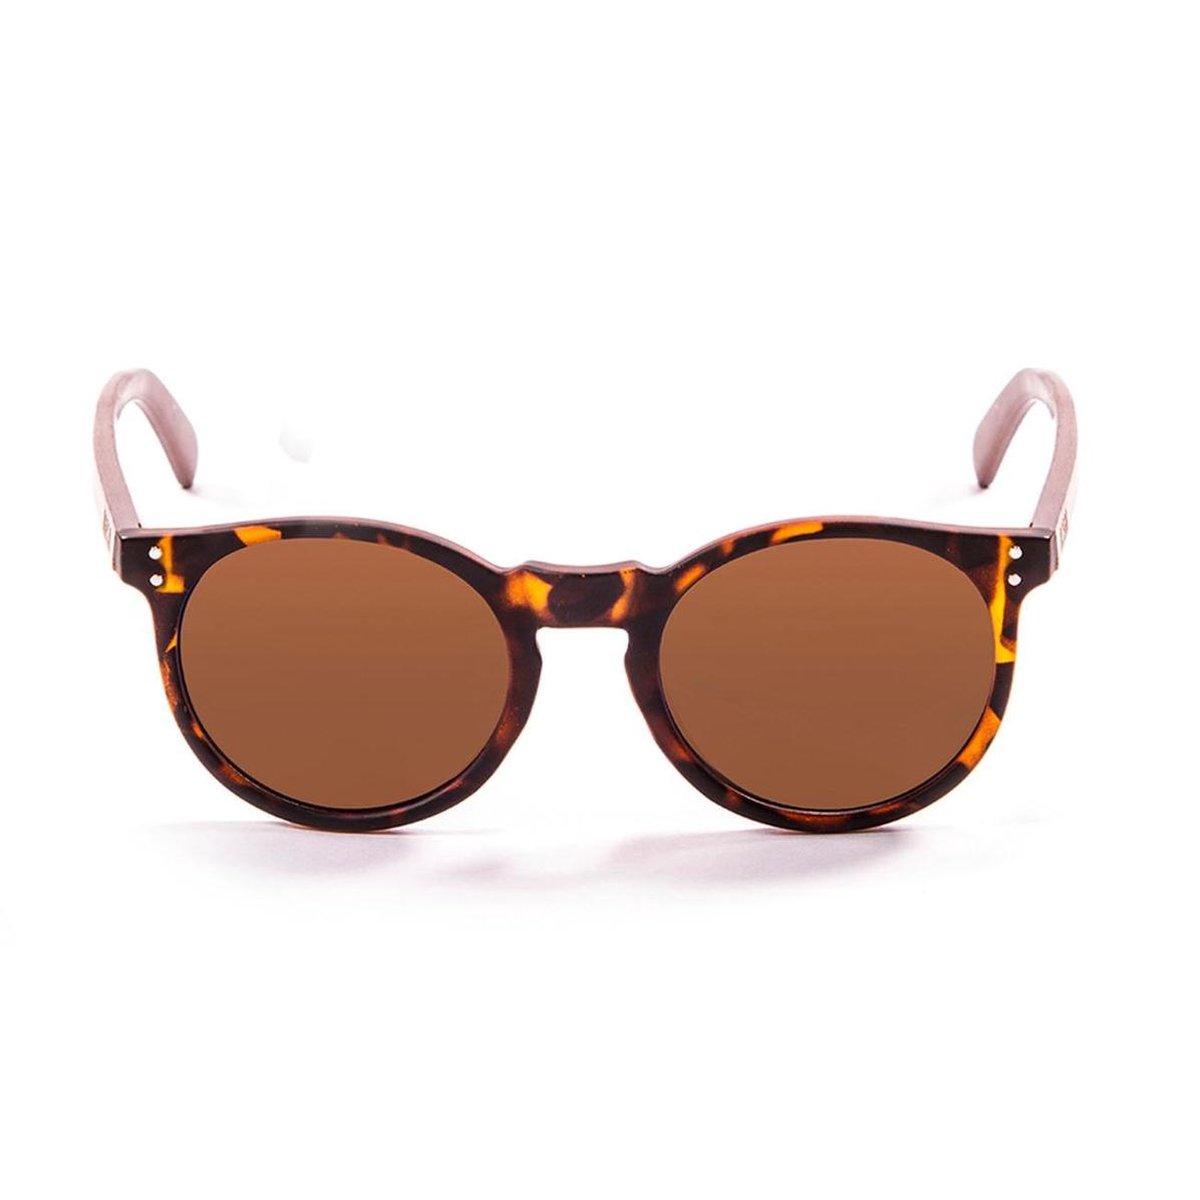 Ocean Sunglasses - LIZARD WOOD - Unisex Zonnebril Bruin - Ocean Sunglasses